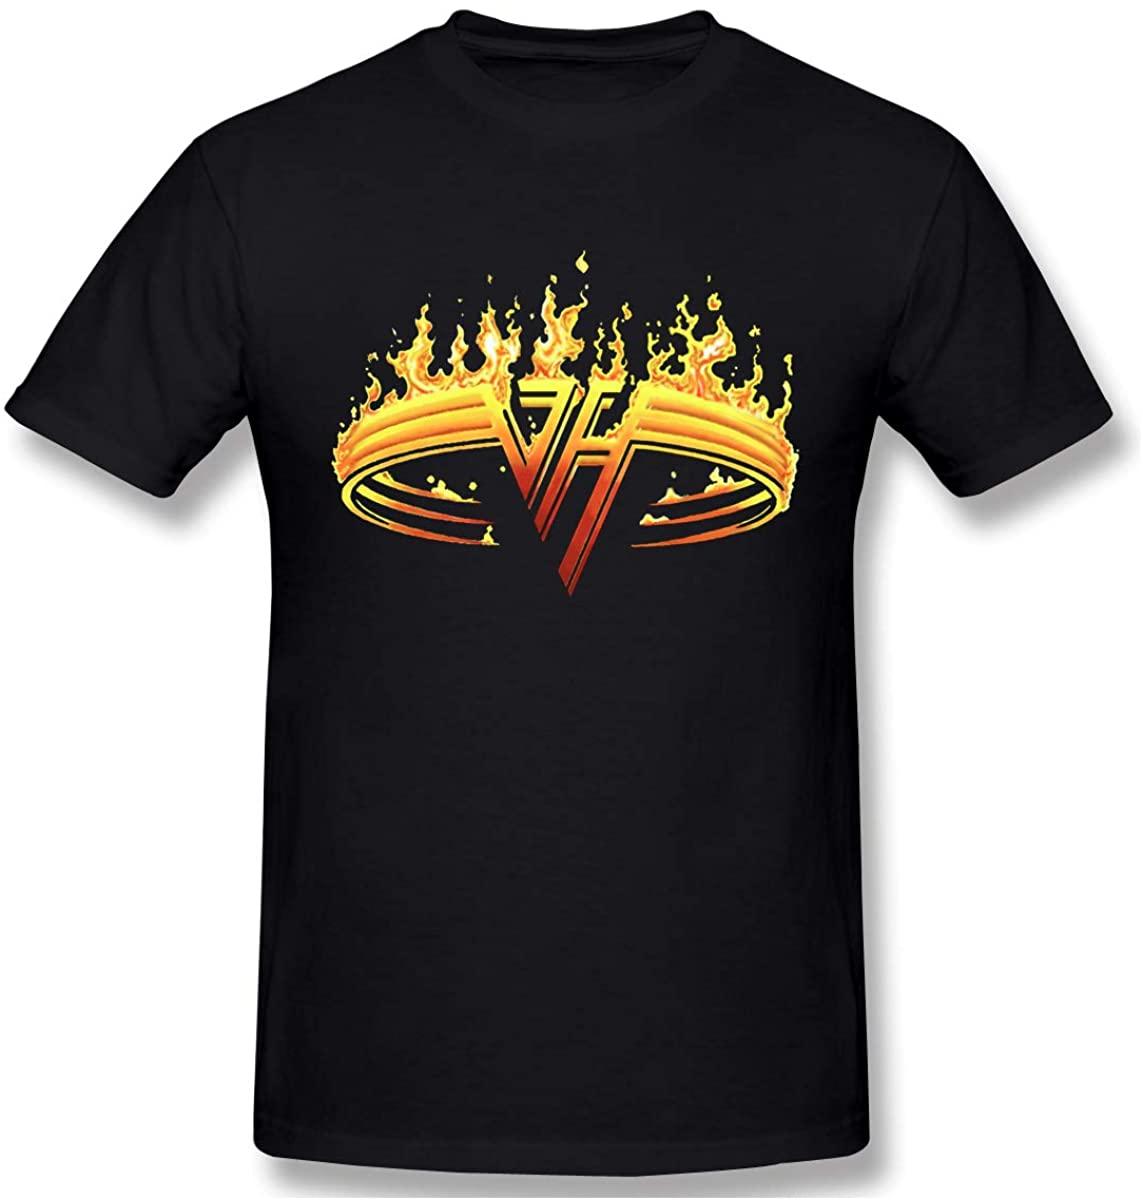 Men's Van Halen 1984 Fashion Custom Casual Short-Sleeved T-Shirt